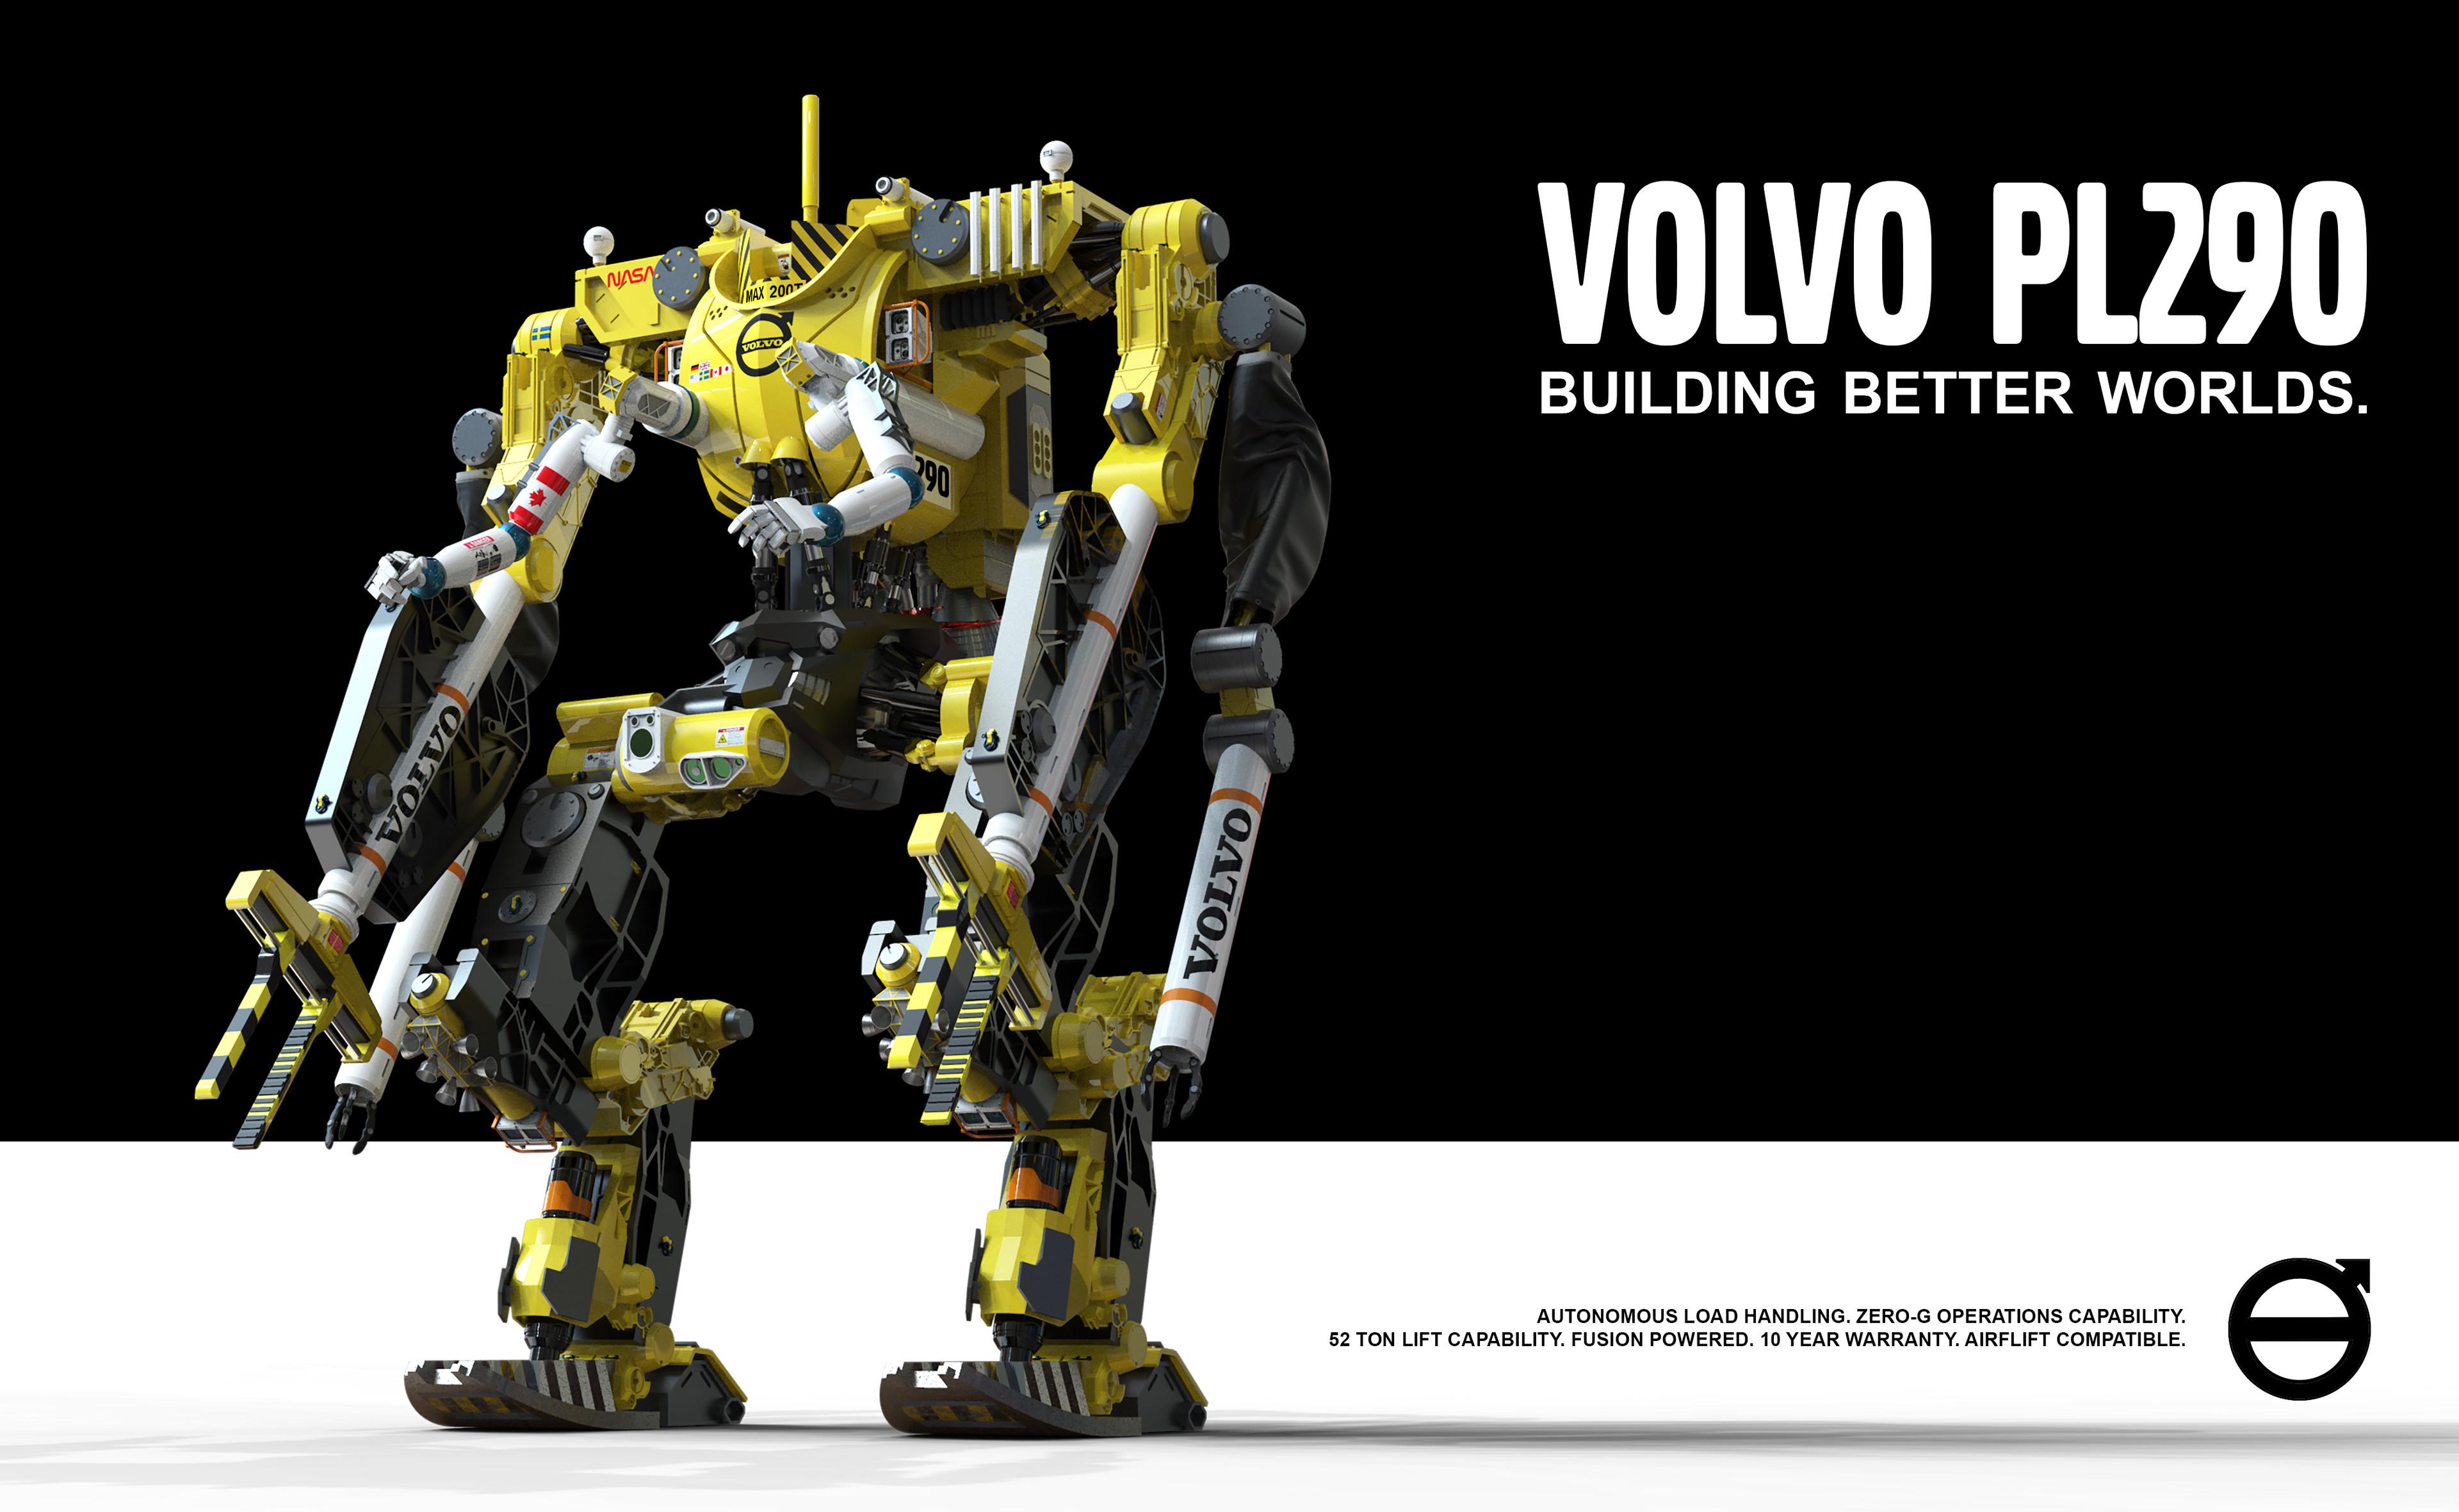 Volvo PL290